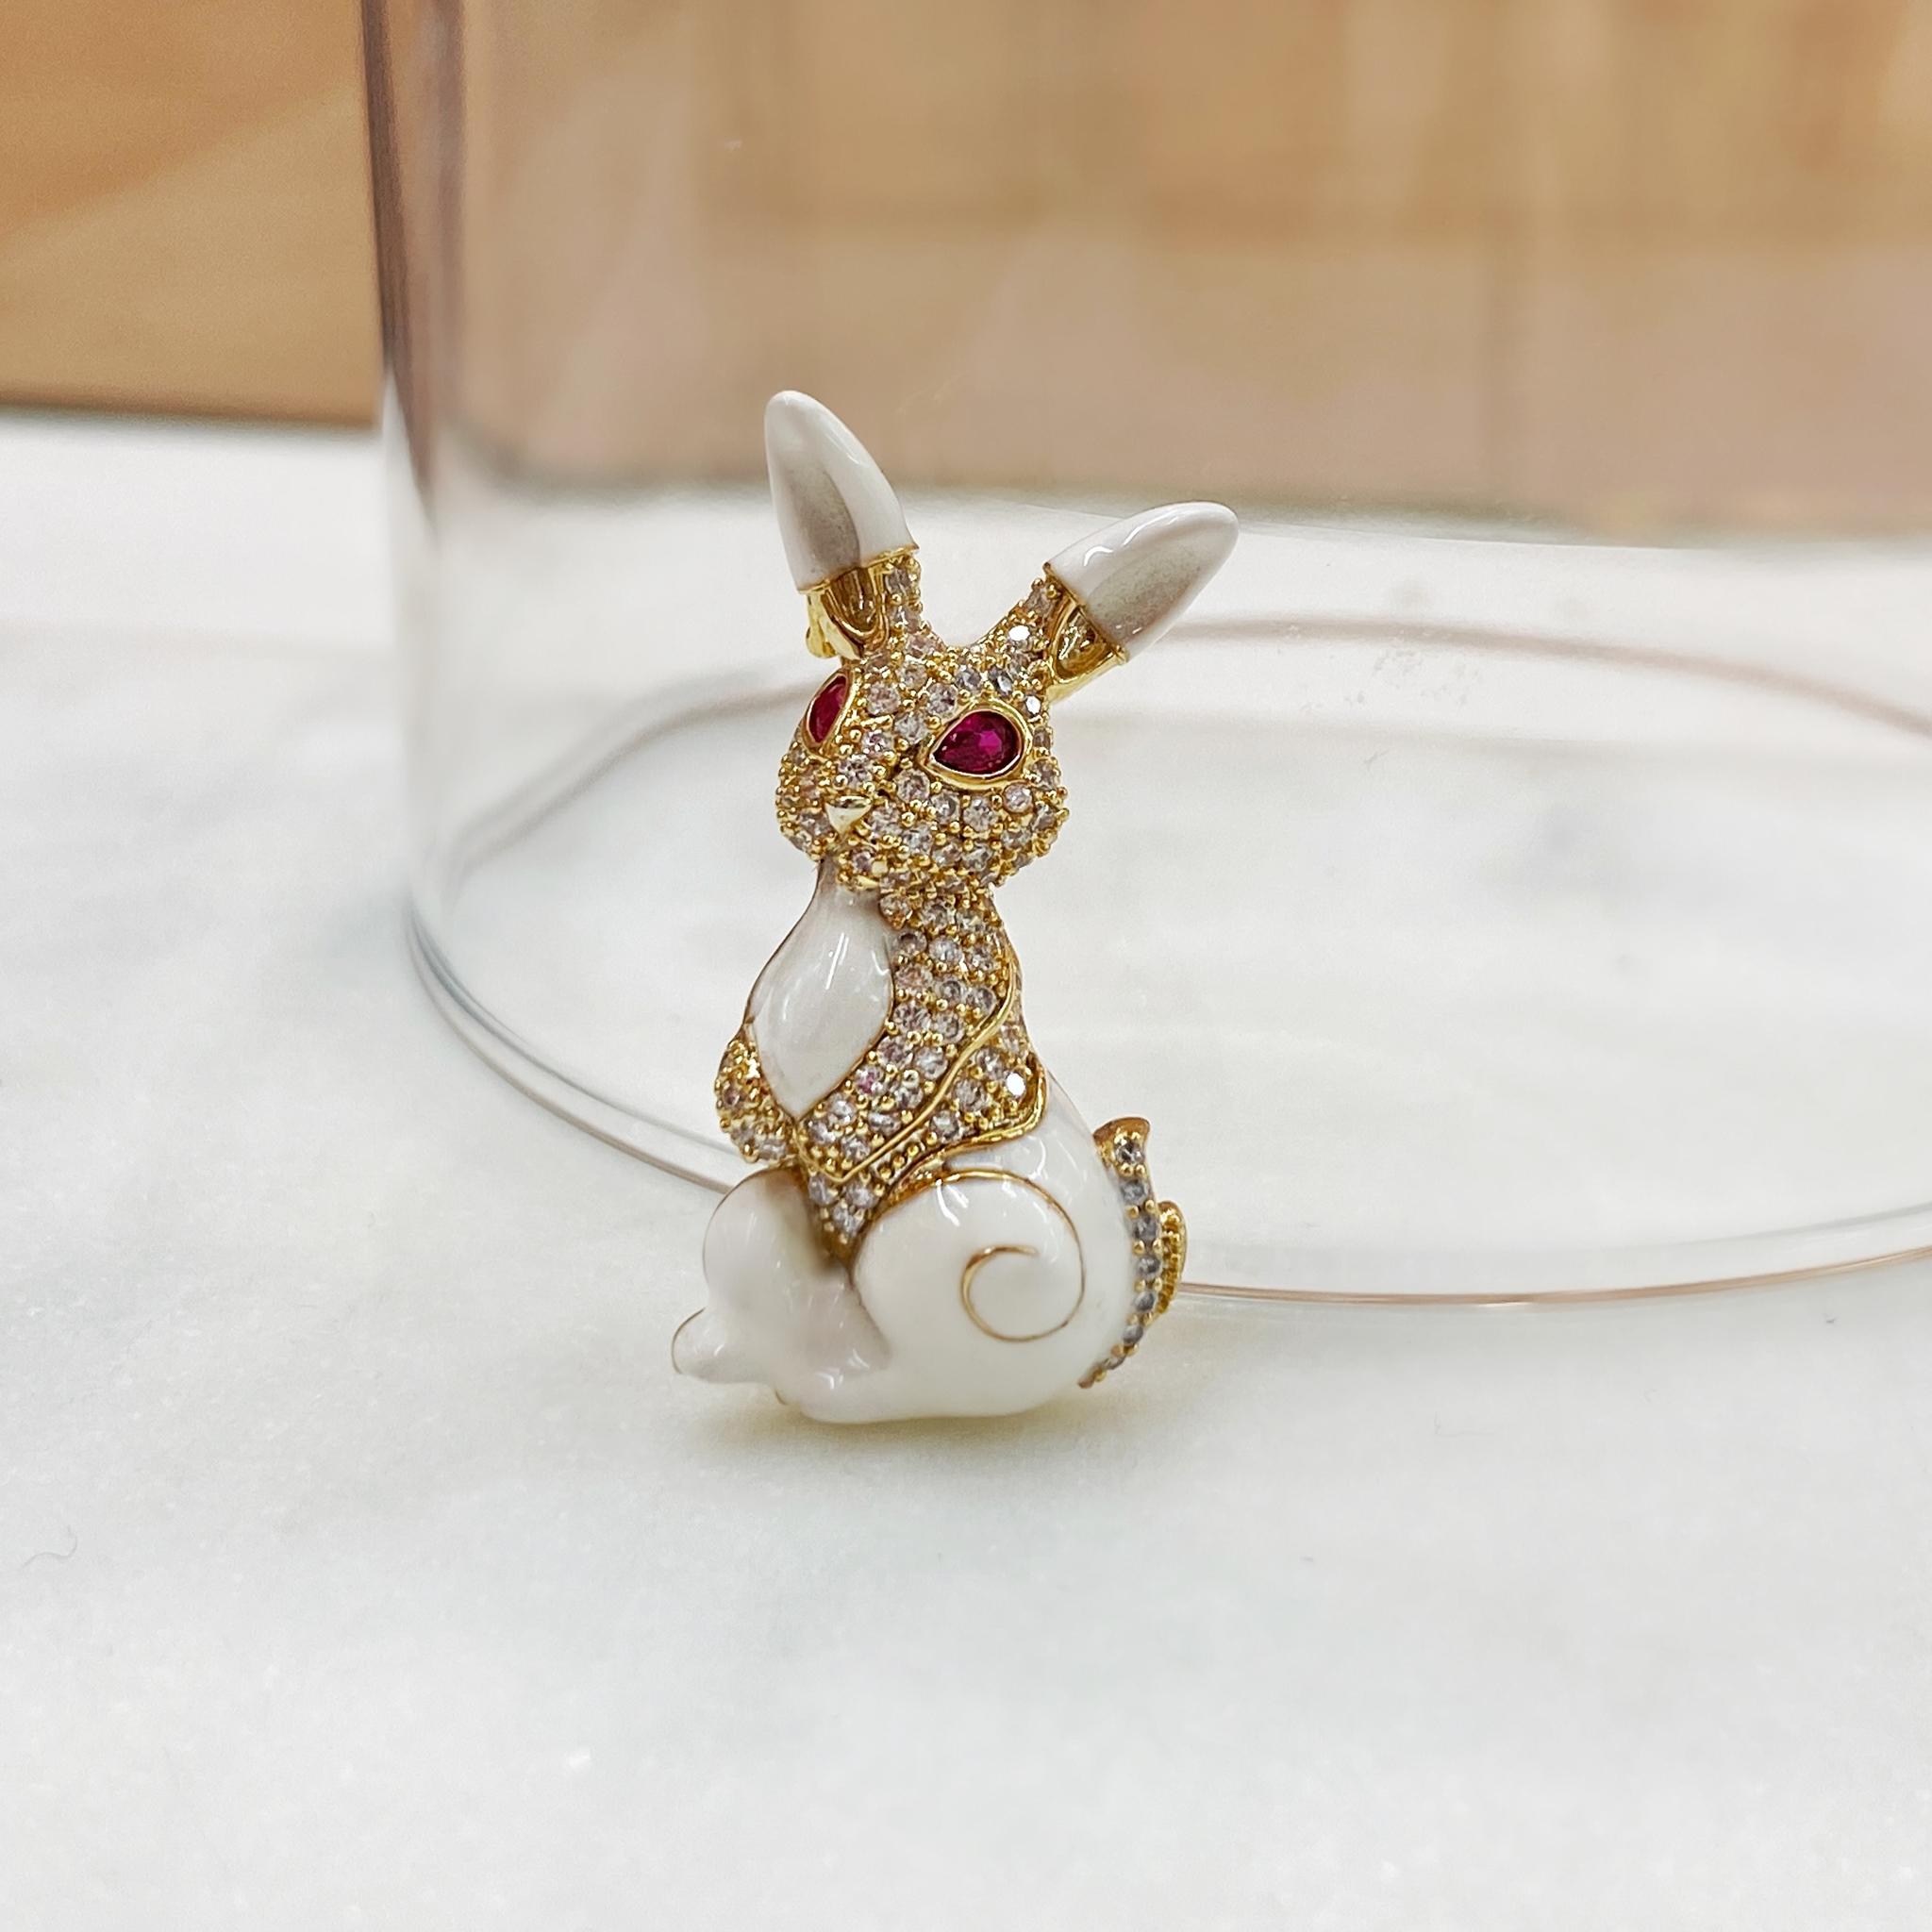 Брошь Циркон Кролик белый эмаль